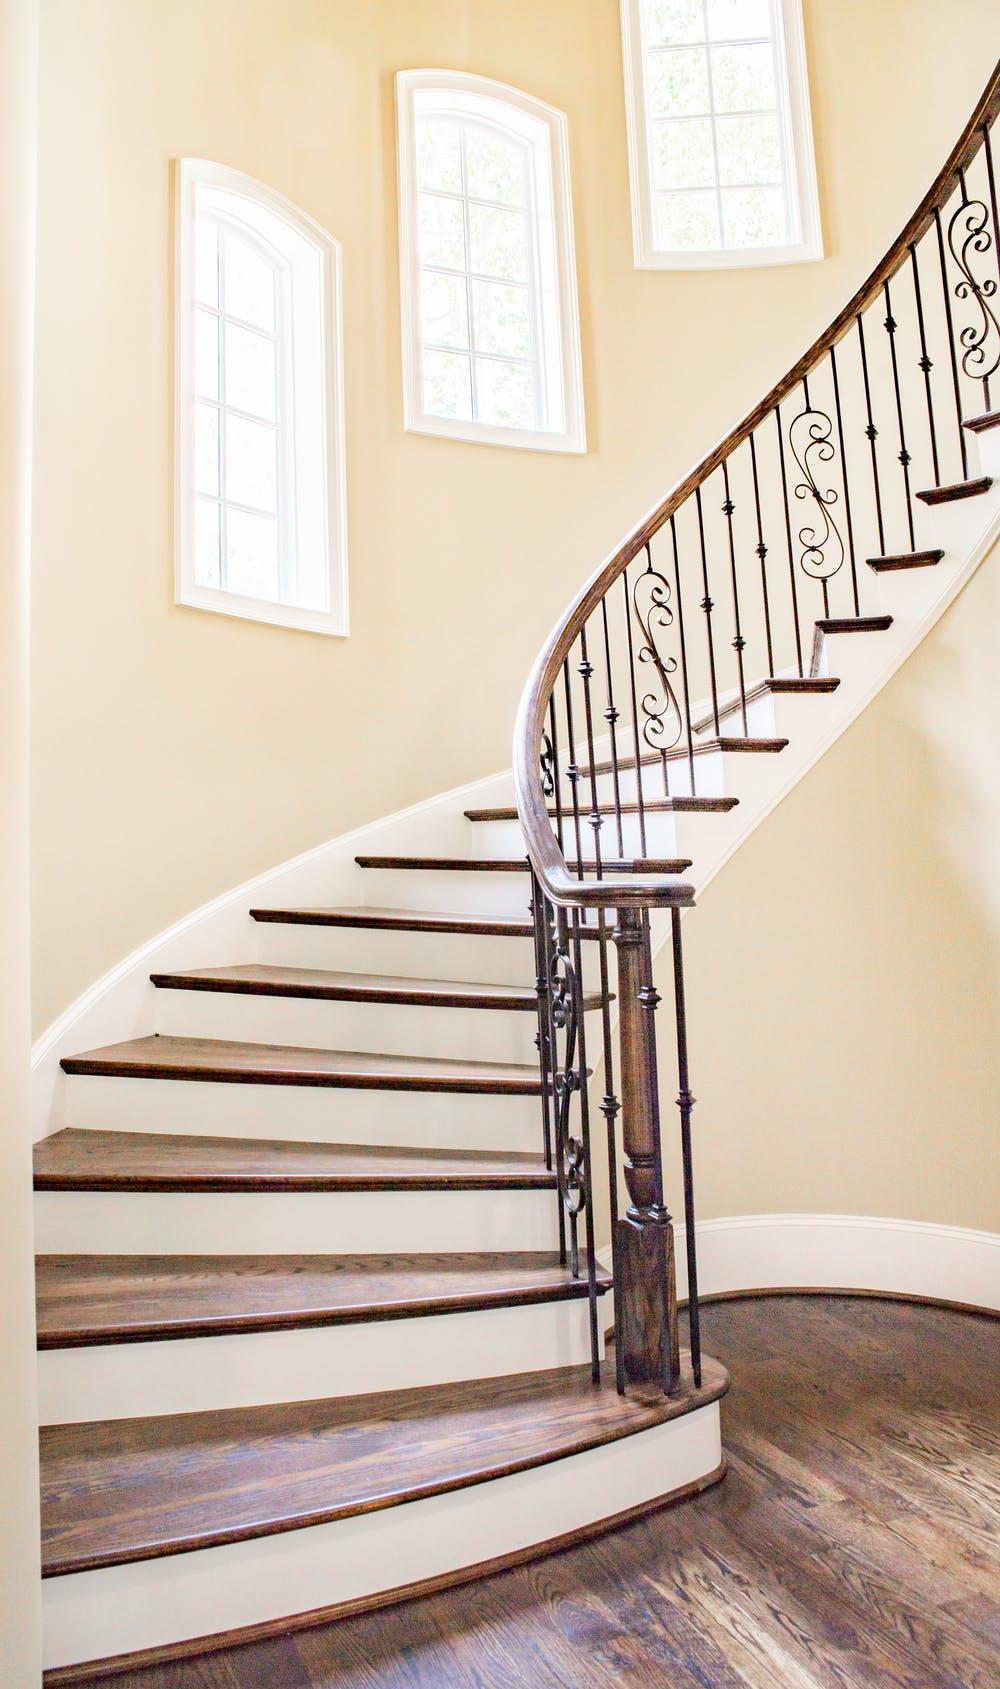 descriptive property listing